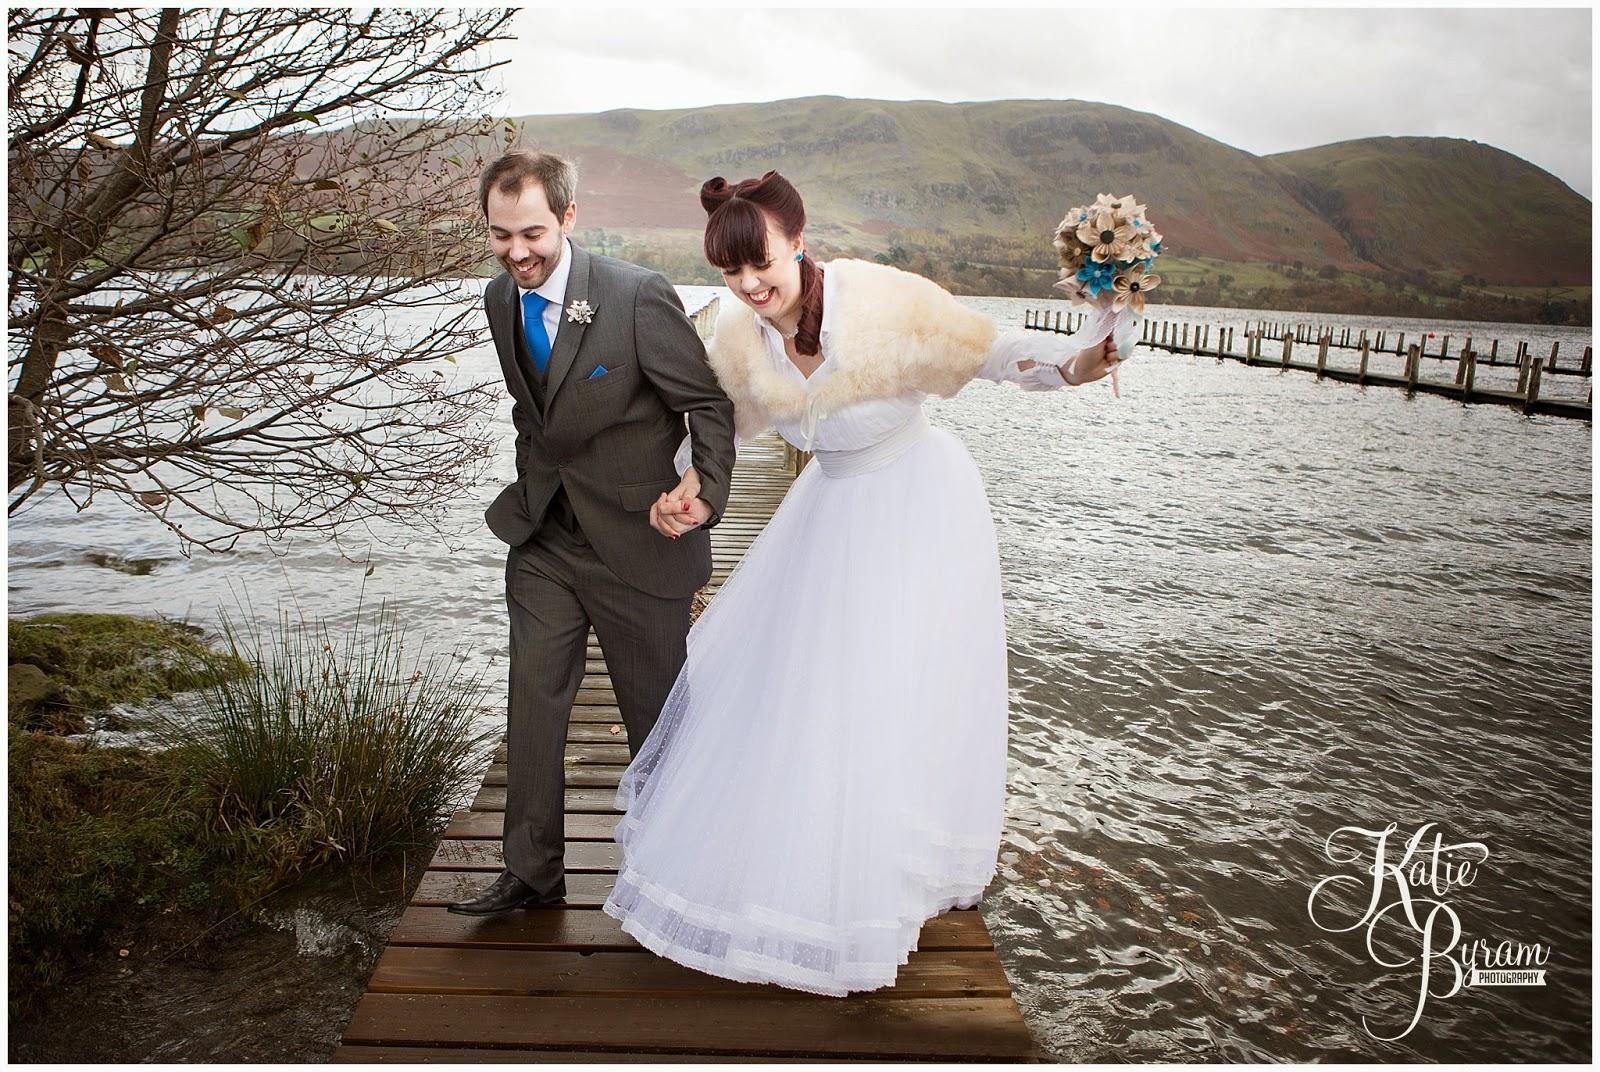 lake district wedding, keswick wedding, rampsbeck country hotel, rampsbeck hotel, inn on the lake wedding, ullswater wedding, katie byram photography,